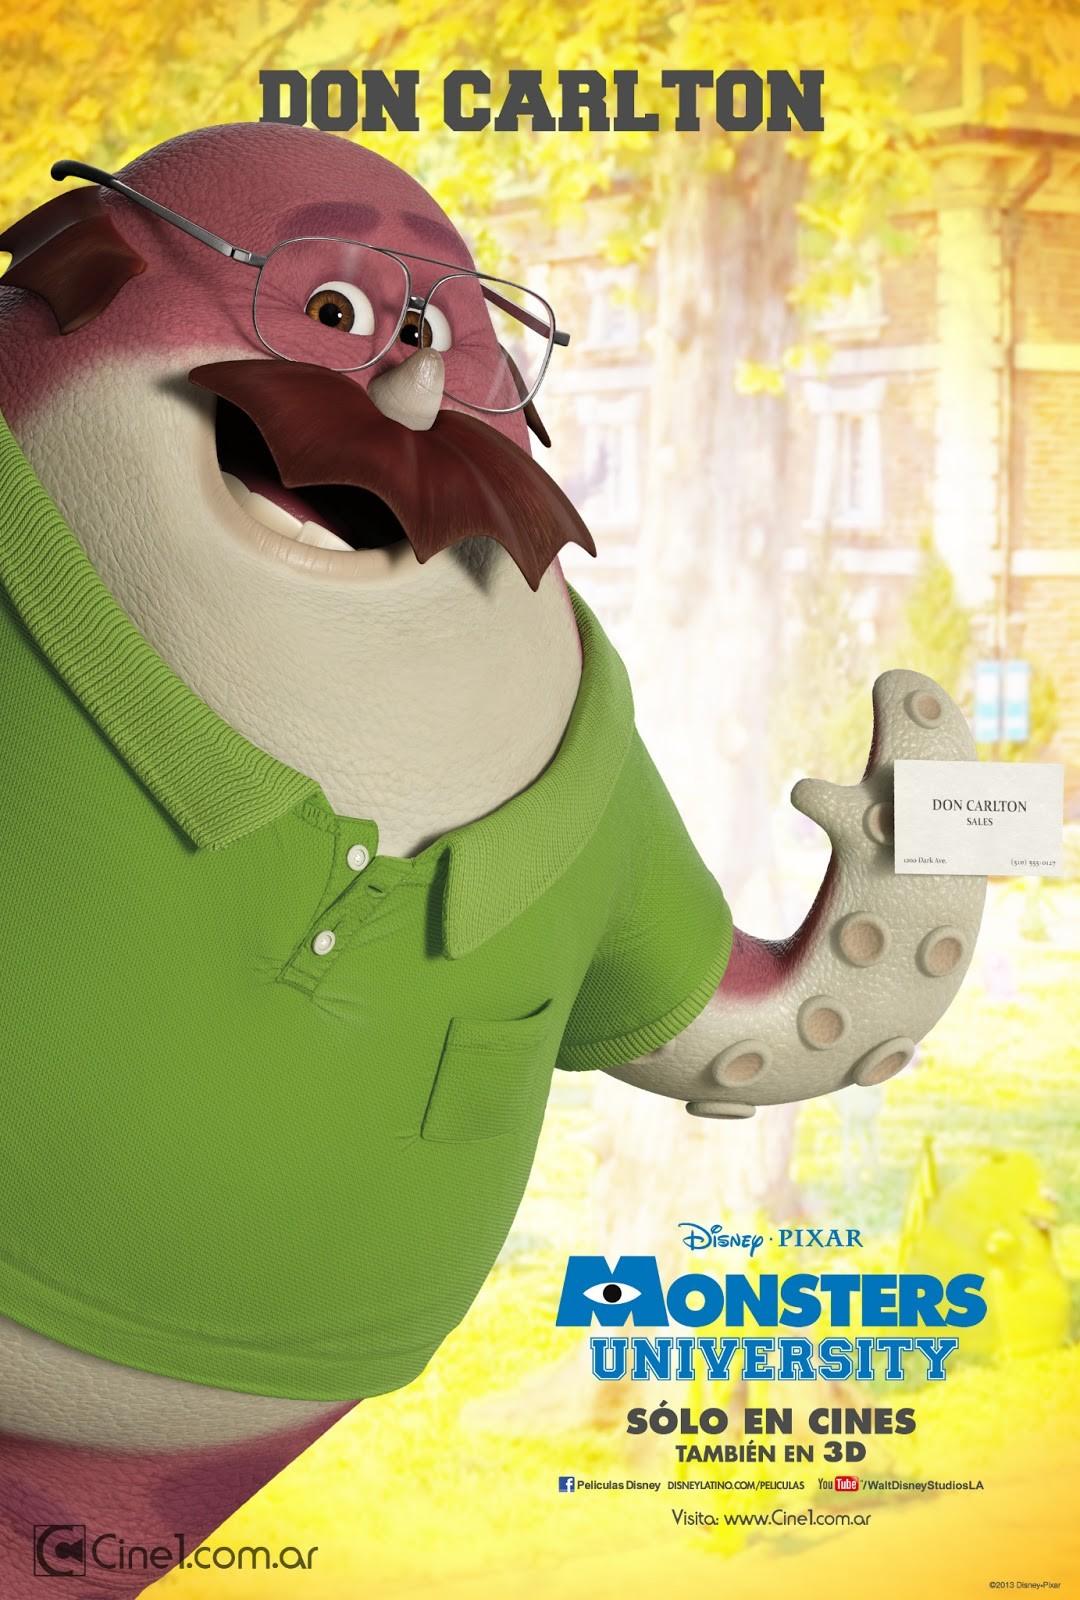 Monsters Inc Series Monsters Inc Wiki Fandom - oc